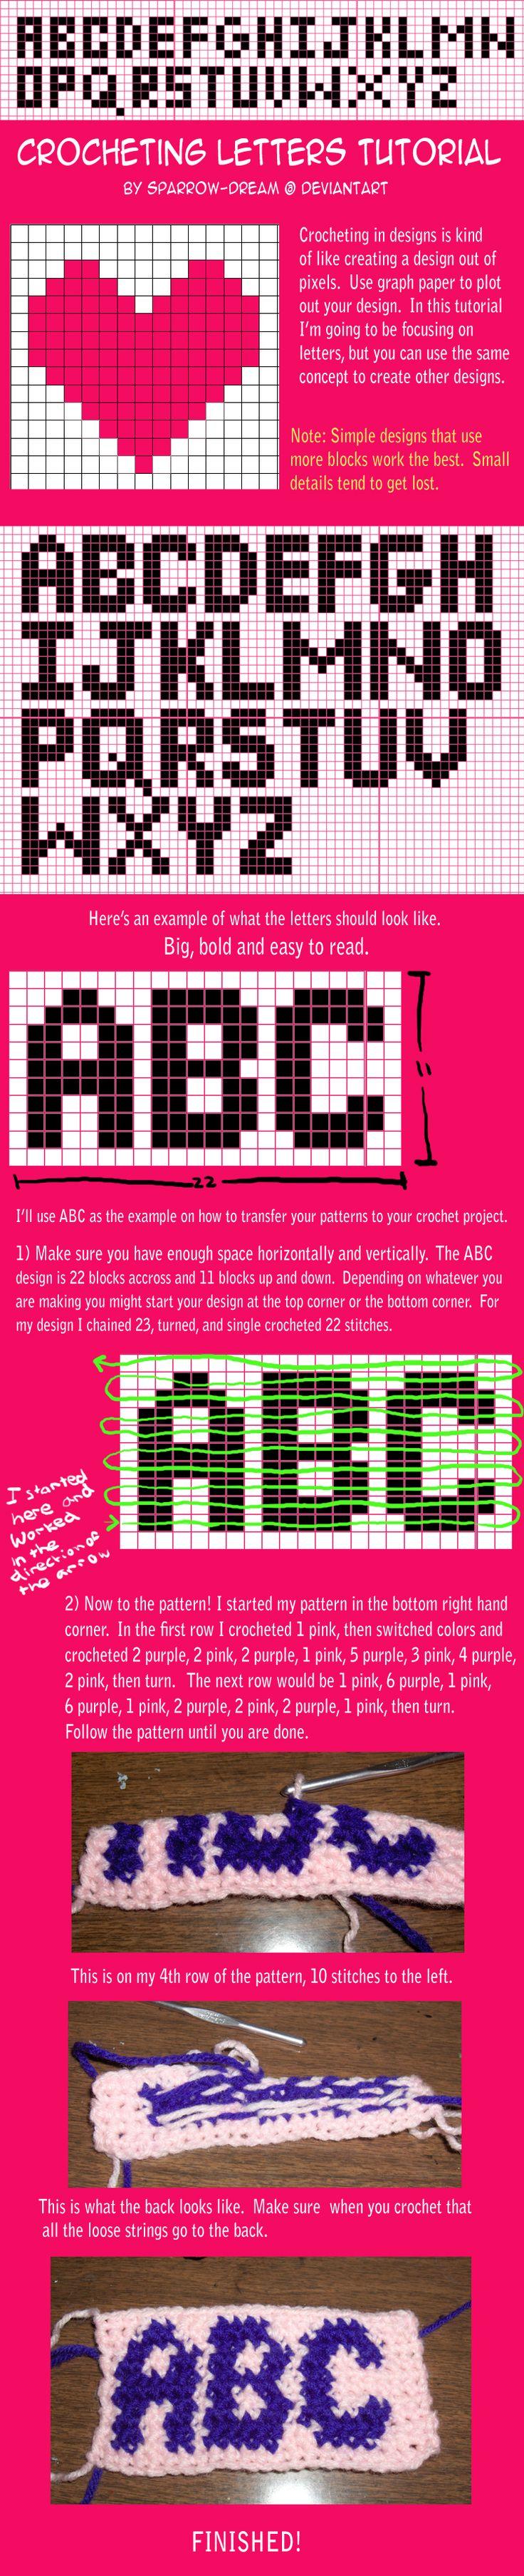 Crocheting Letters Tutorial By ~sparrowdream On Deviantart (for My Crochet  Pupils) Pixel Graph Chart Pattern Crochet